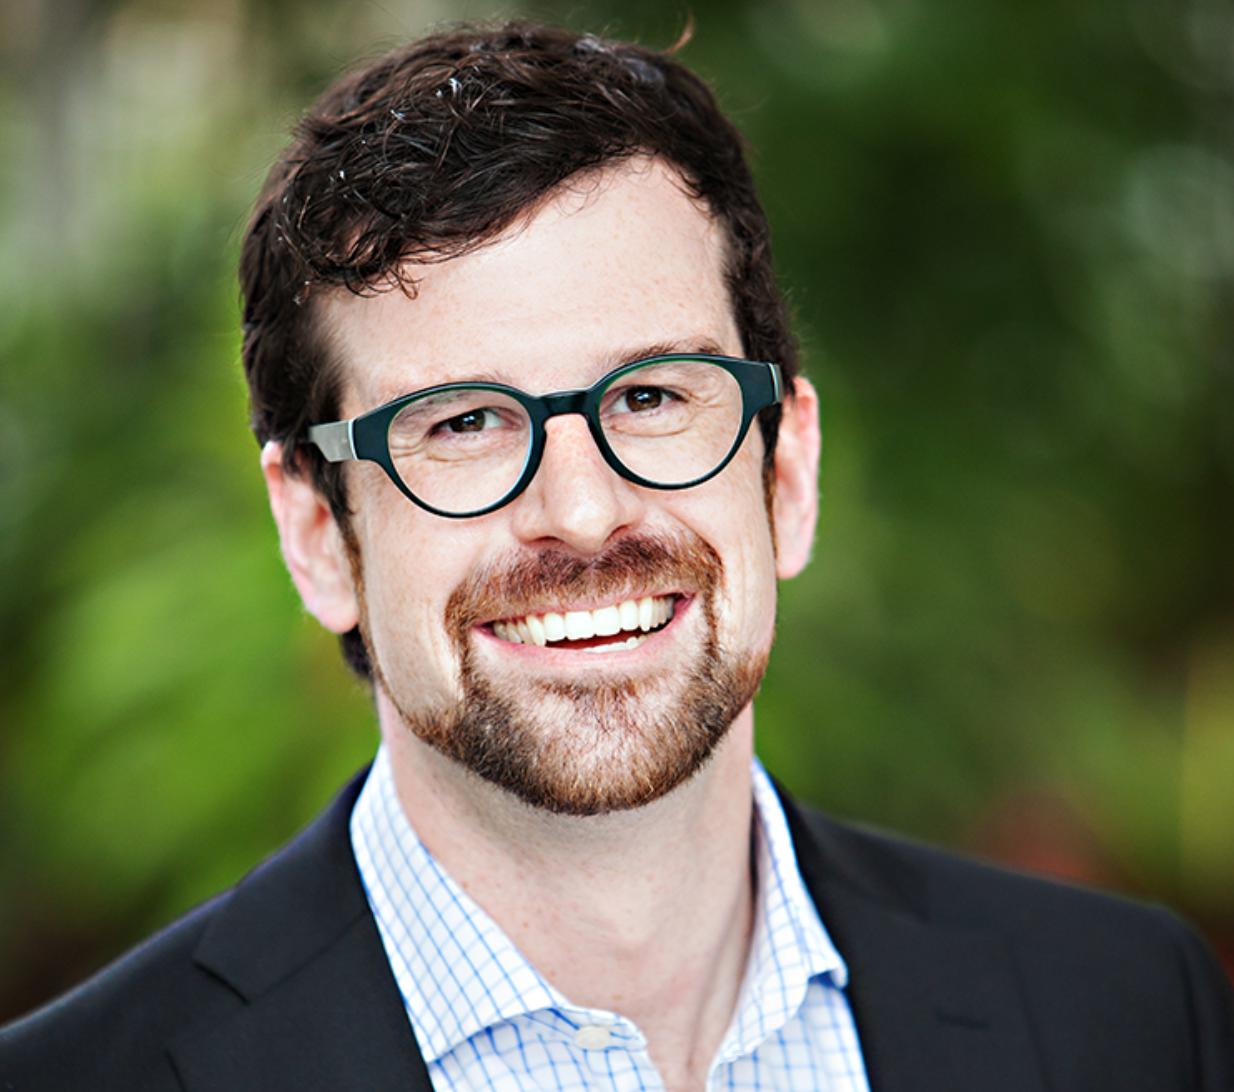 Joshua Meyer - Director of Marketing at OneCause